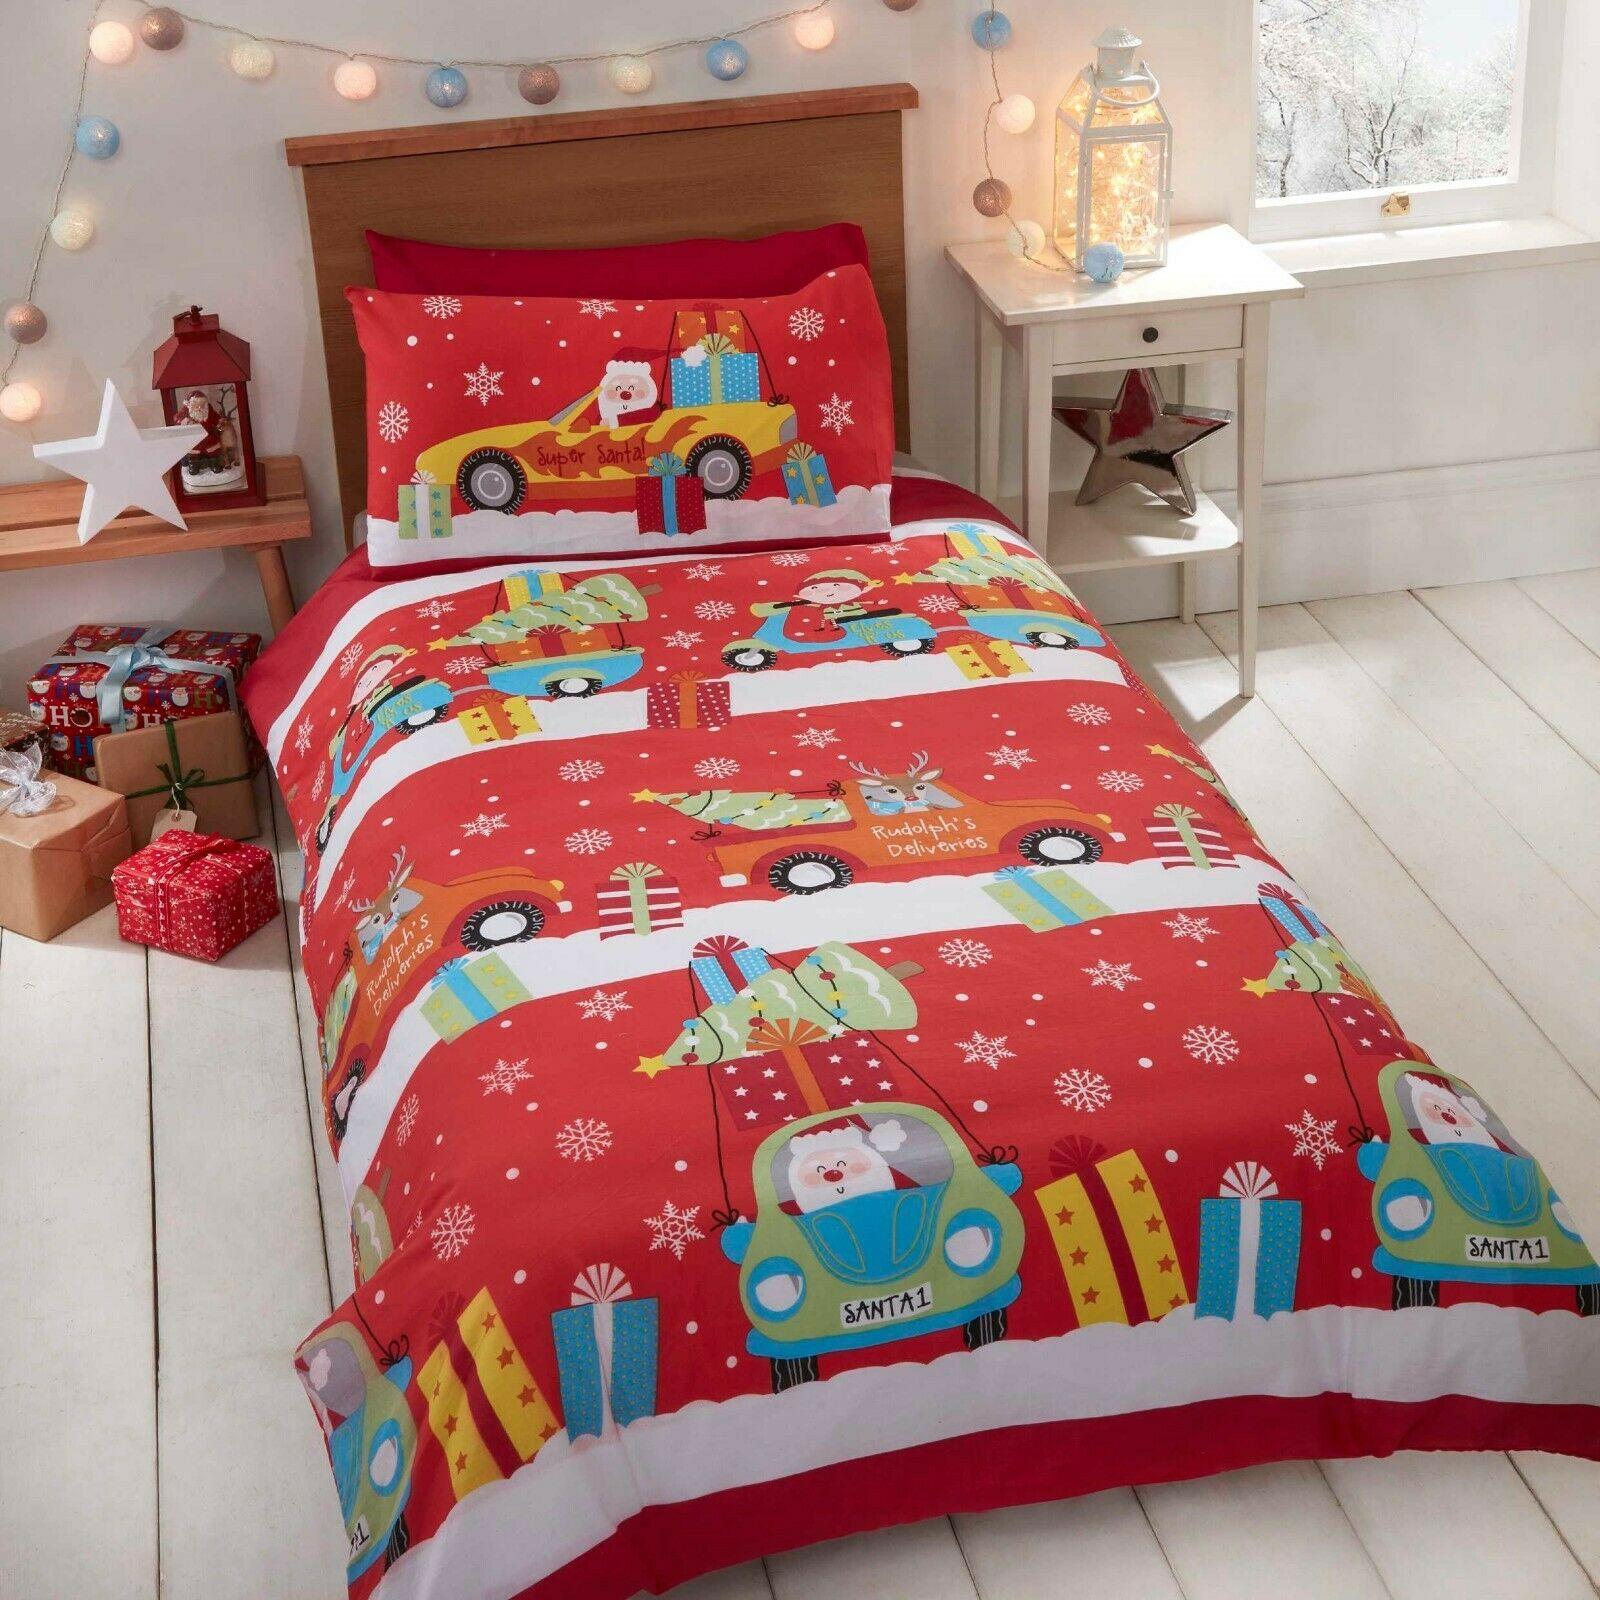 Santa Stop Here Christmas Red Single Duvet Cover And Pillowcase Set Kids Bedding Sfhs Org